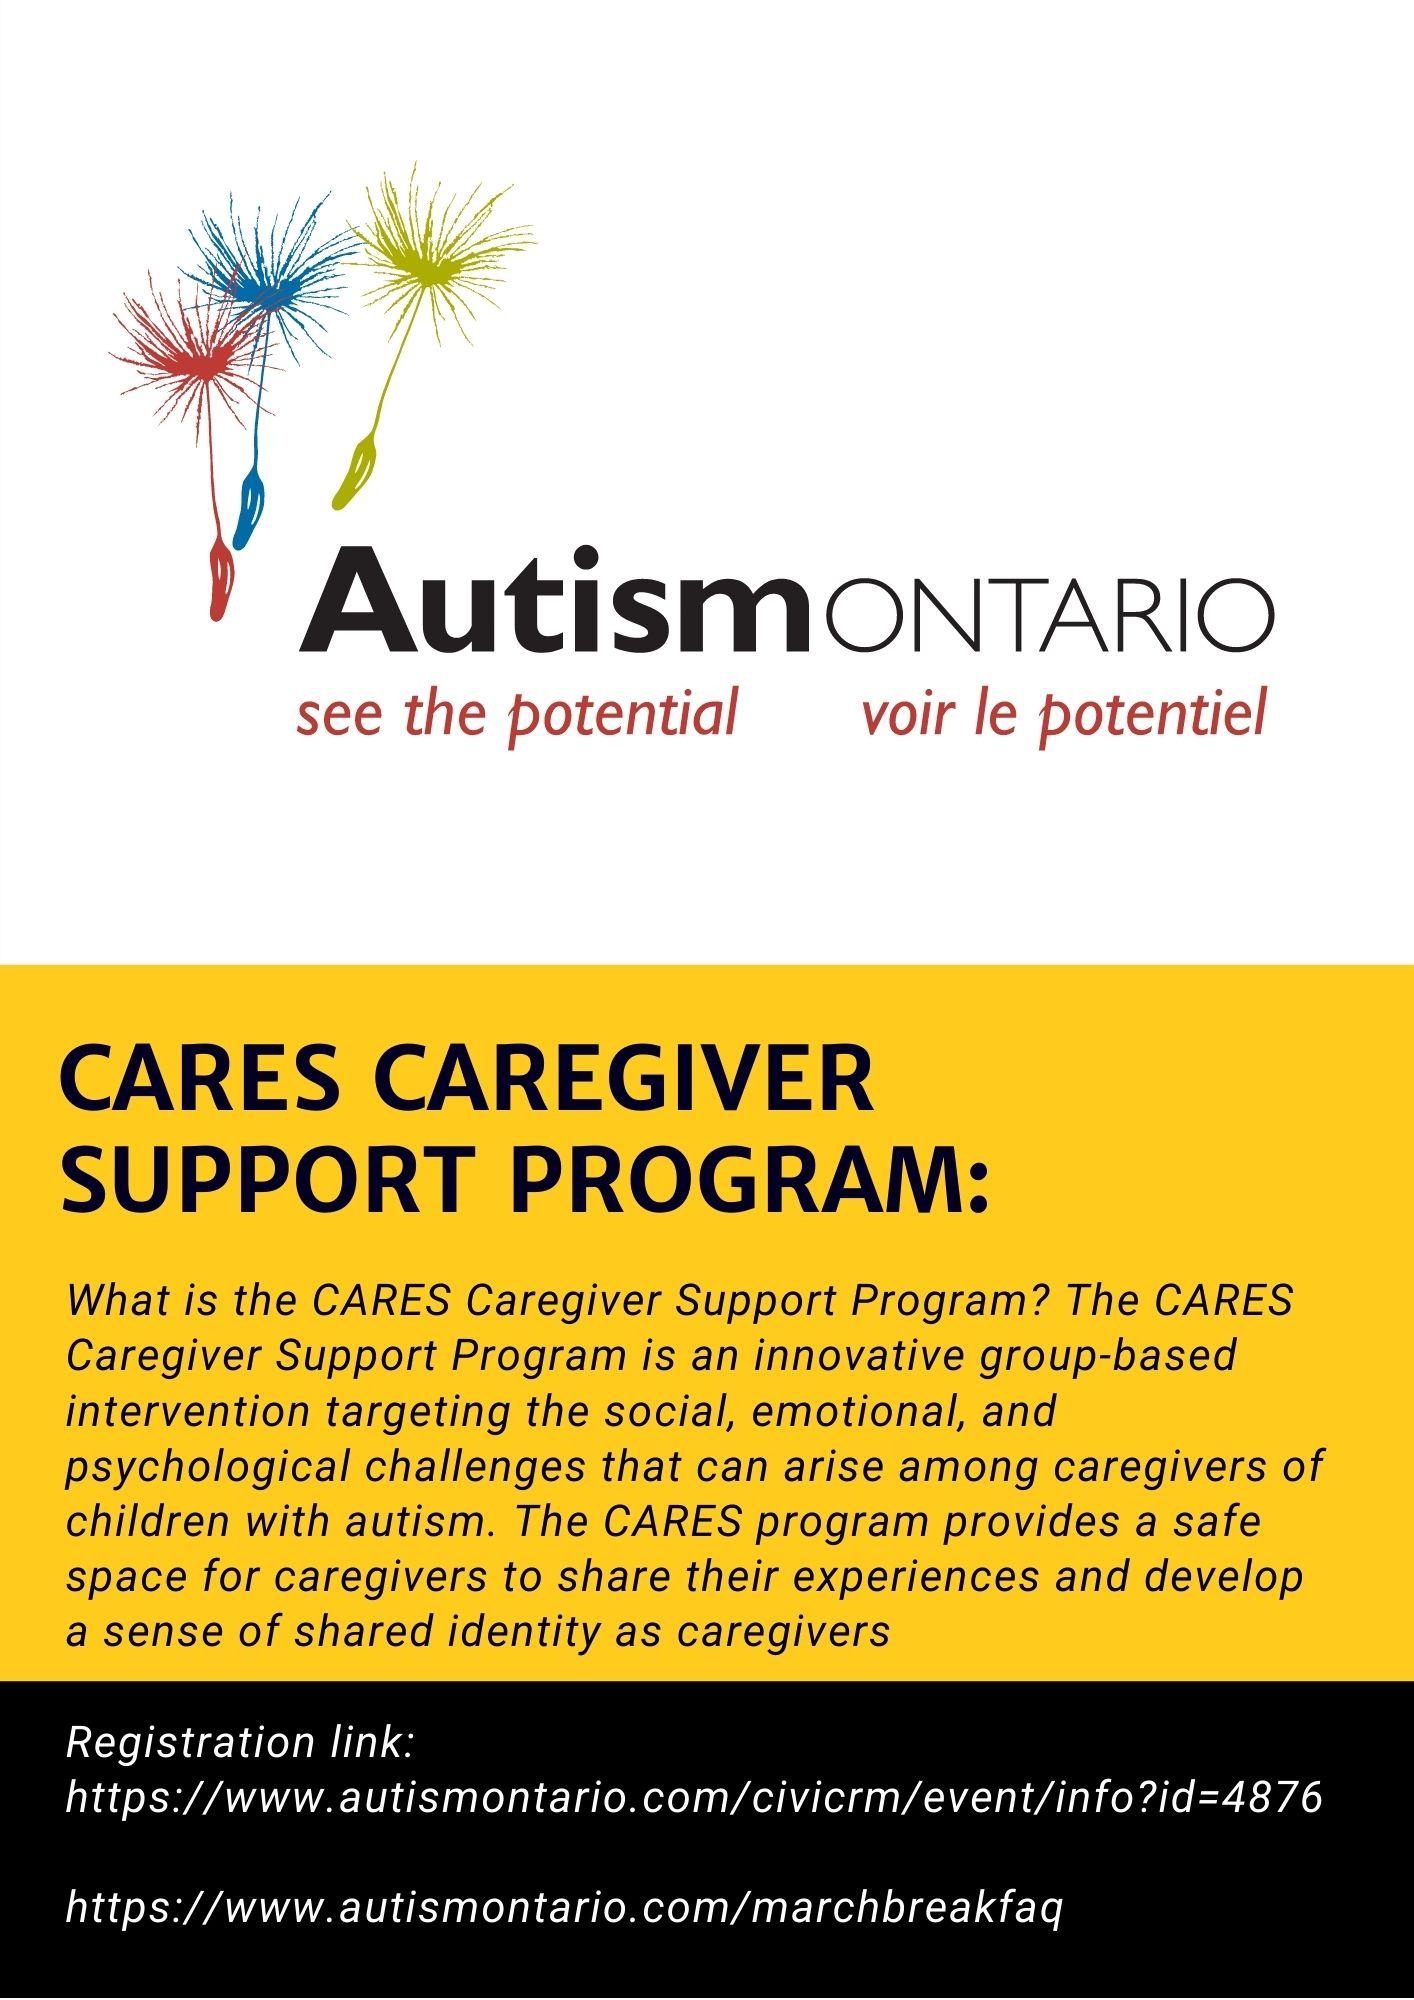 Autism Ontario Cares Caregiver Support Program Flyer